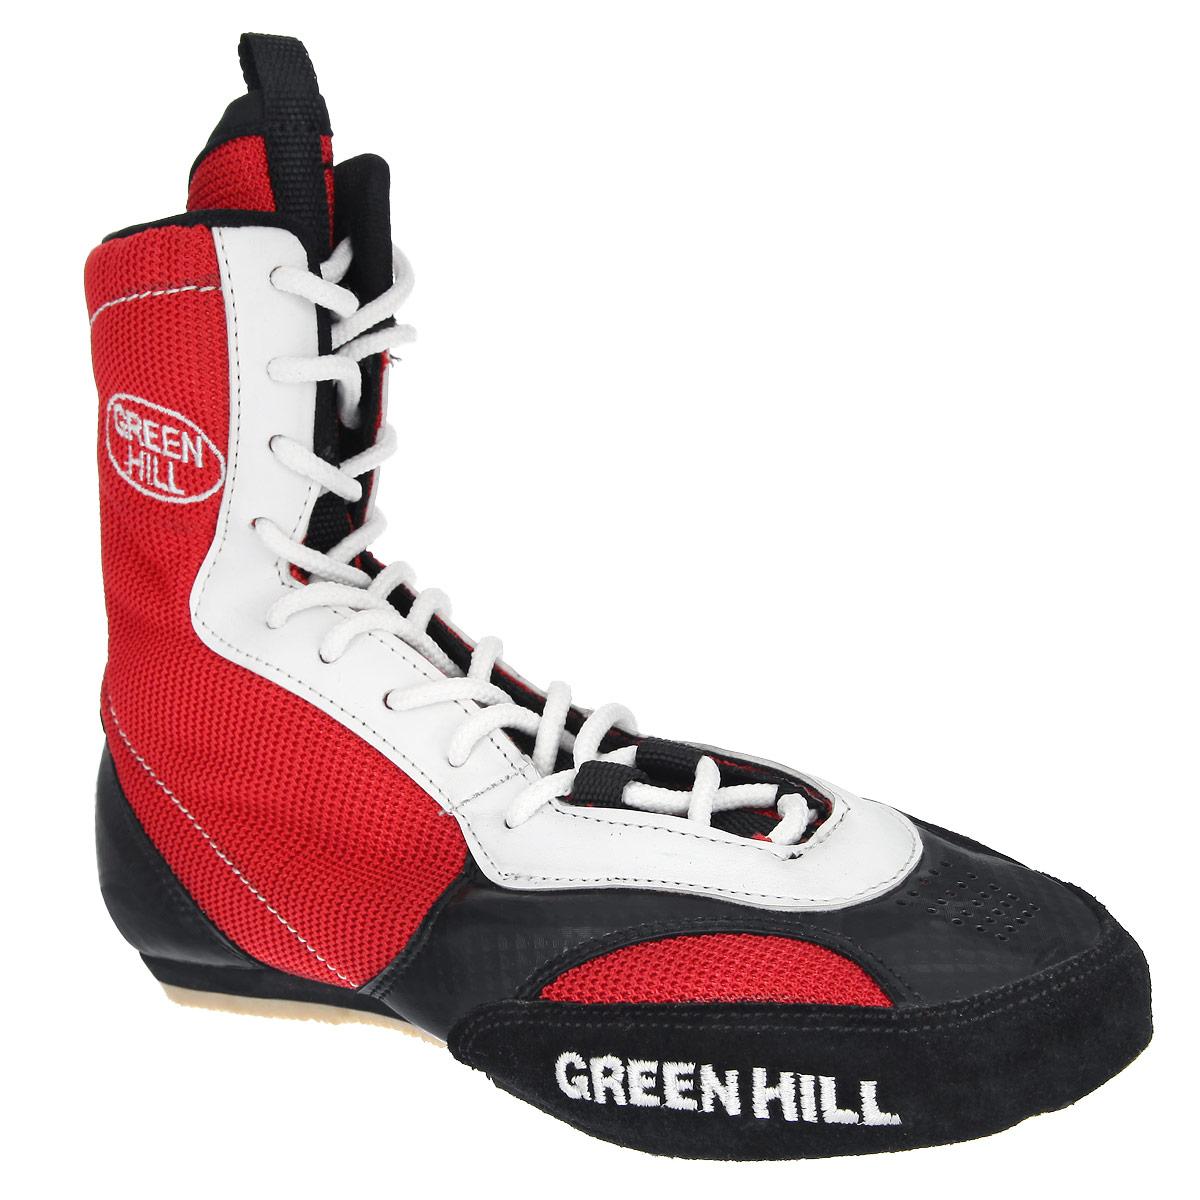 Боксерки Green Hill, цвет: красный. BS-0001. Размер 41